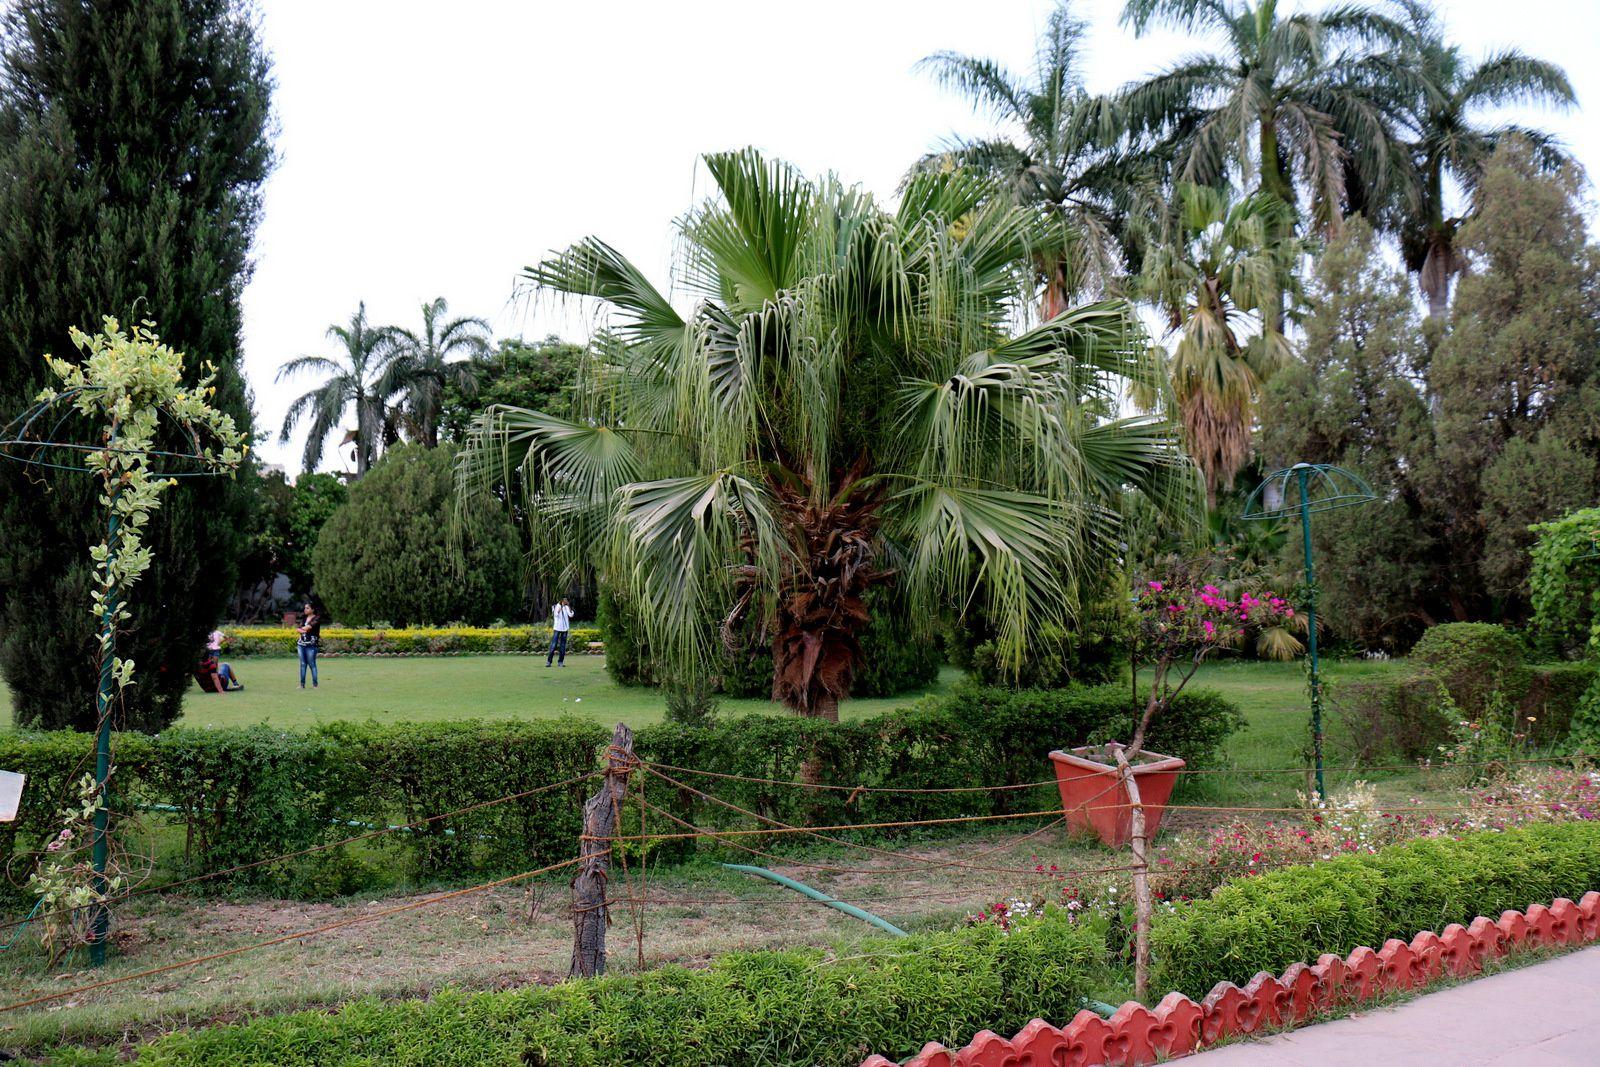 Jardin &quot&#x3B;Sahelion Ki Bari&quot&#x3B;, Udaipur, Inde